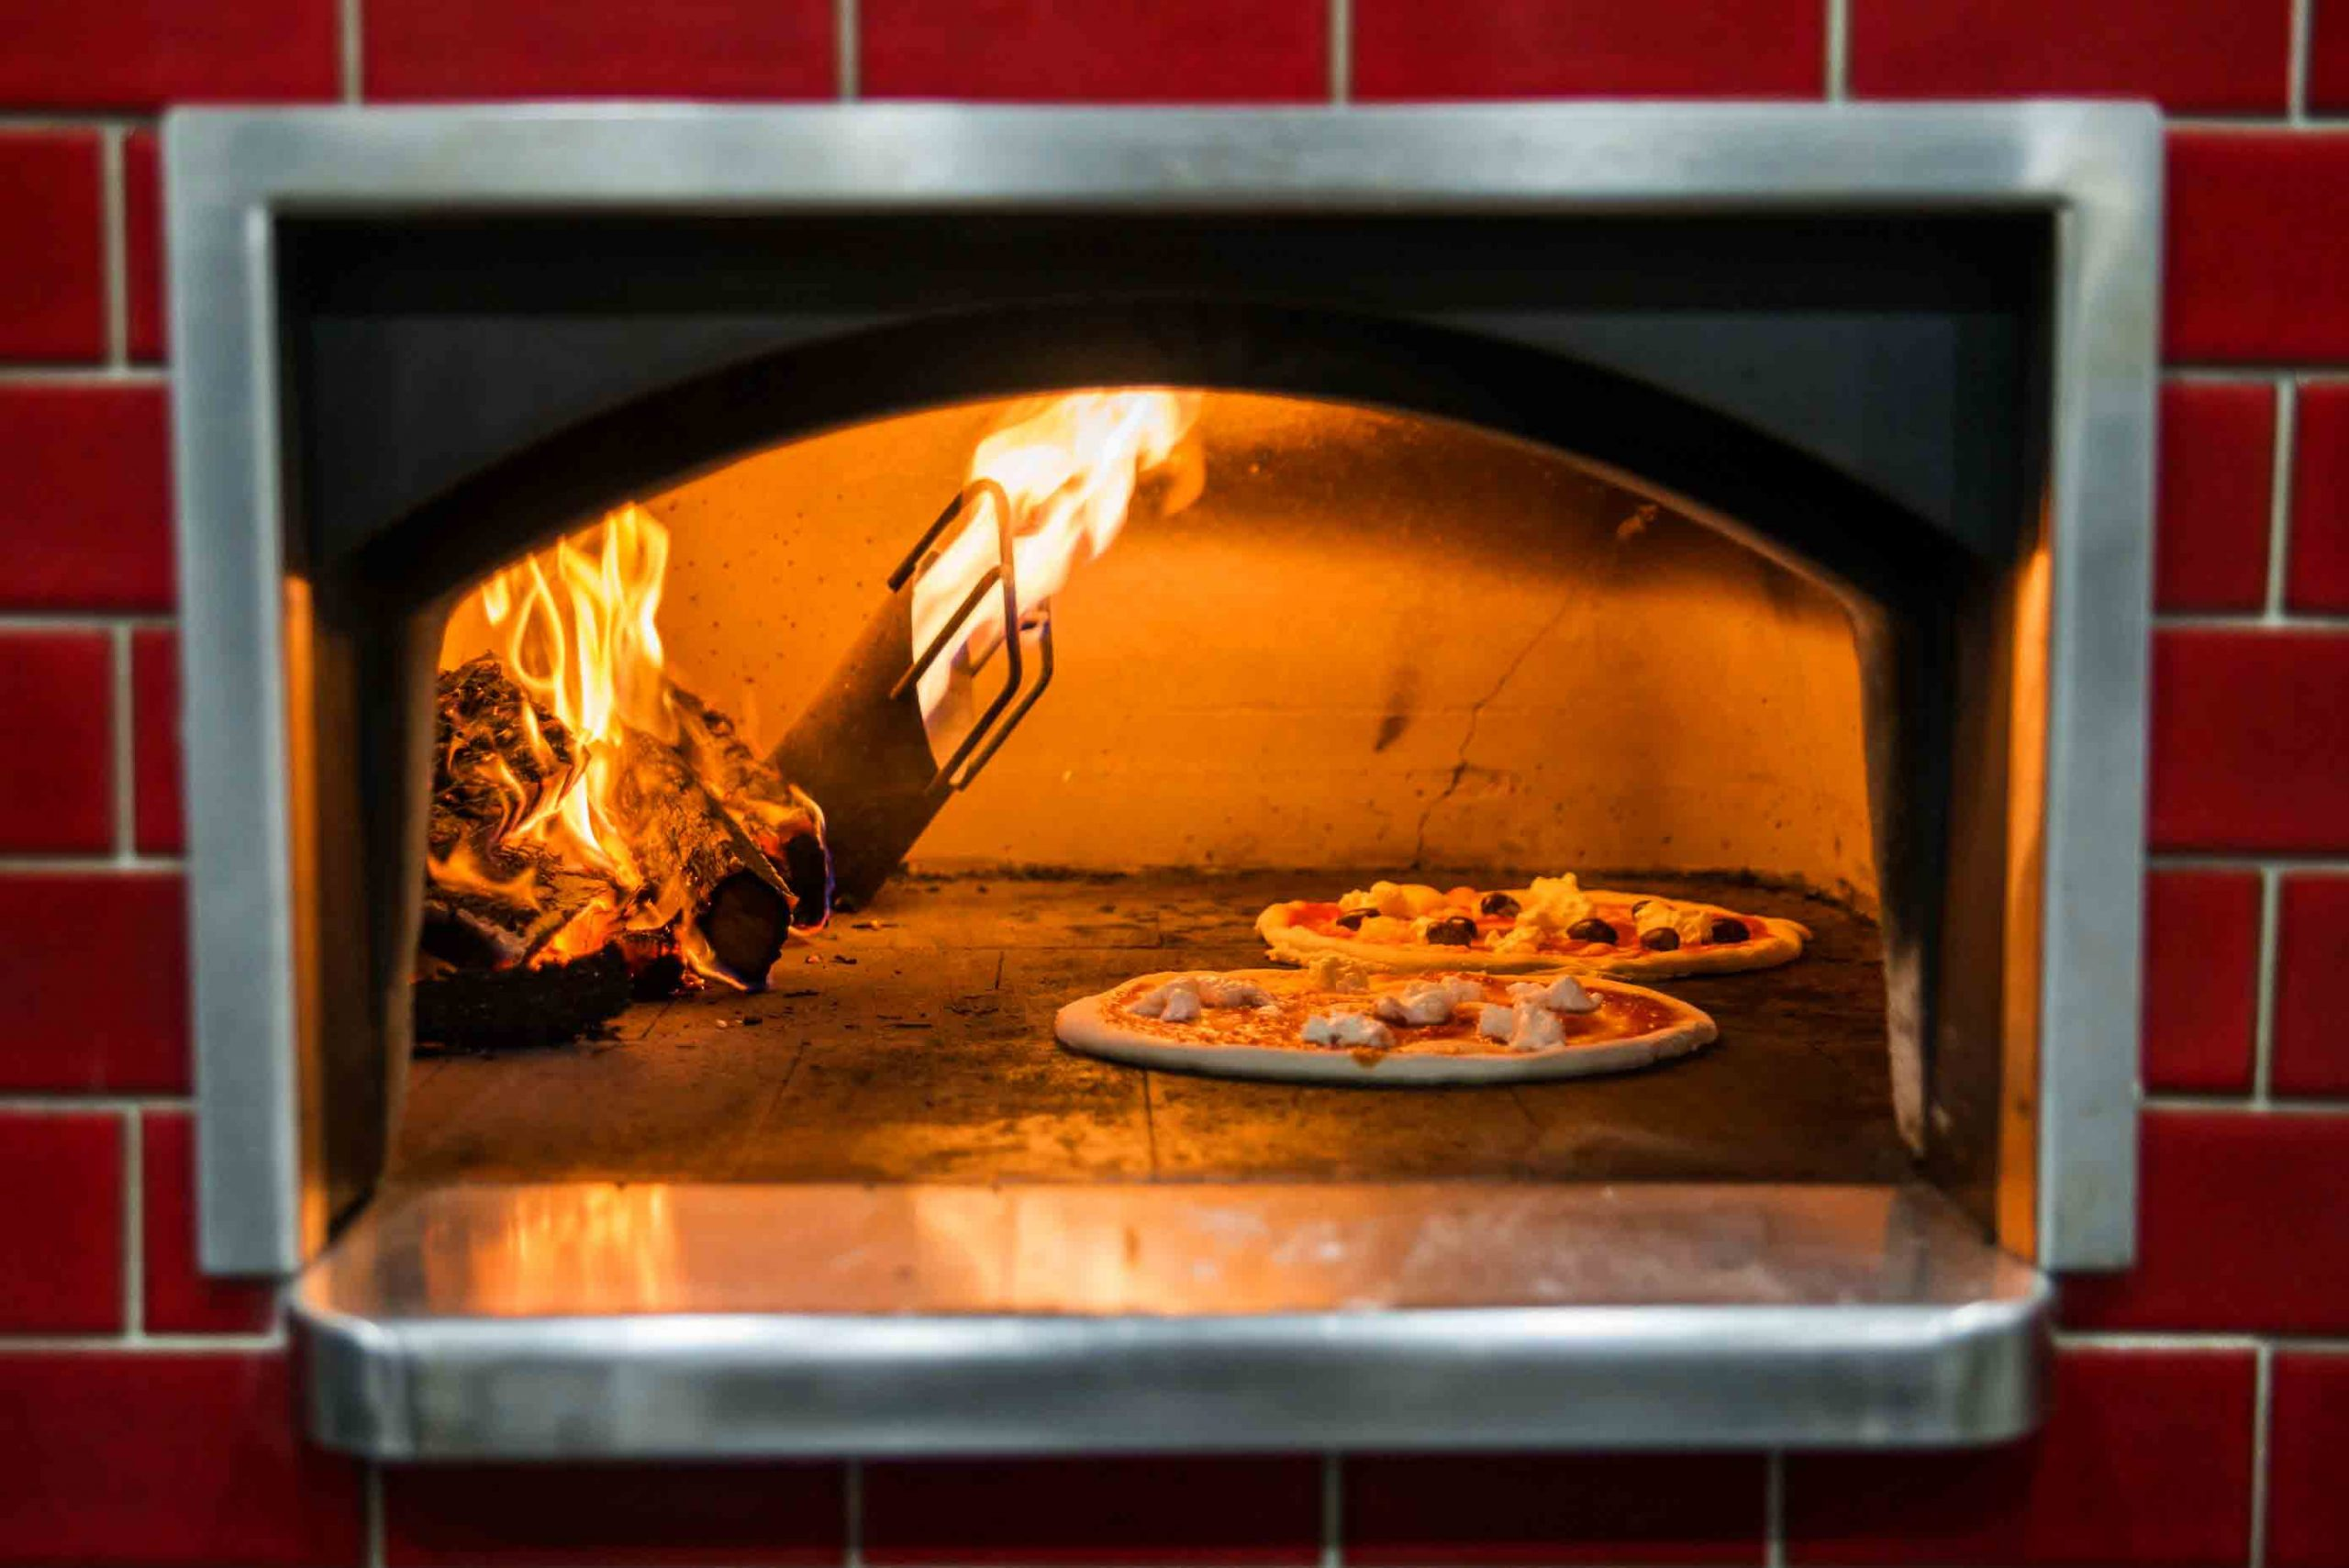 Saint Lucy Caffe E Cucina <br/> Best Italian Eats